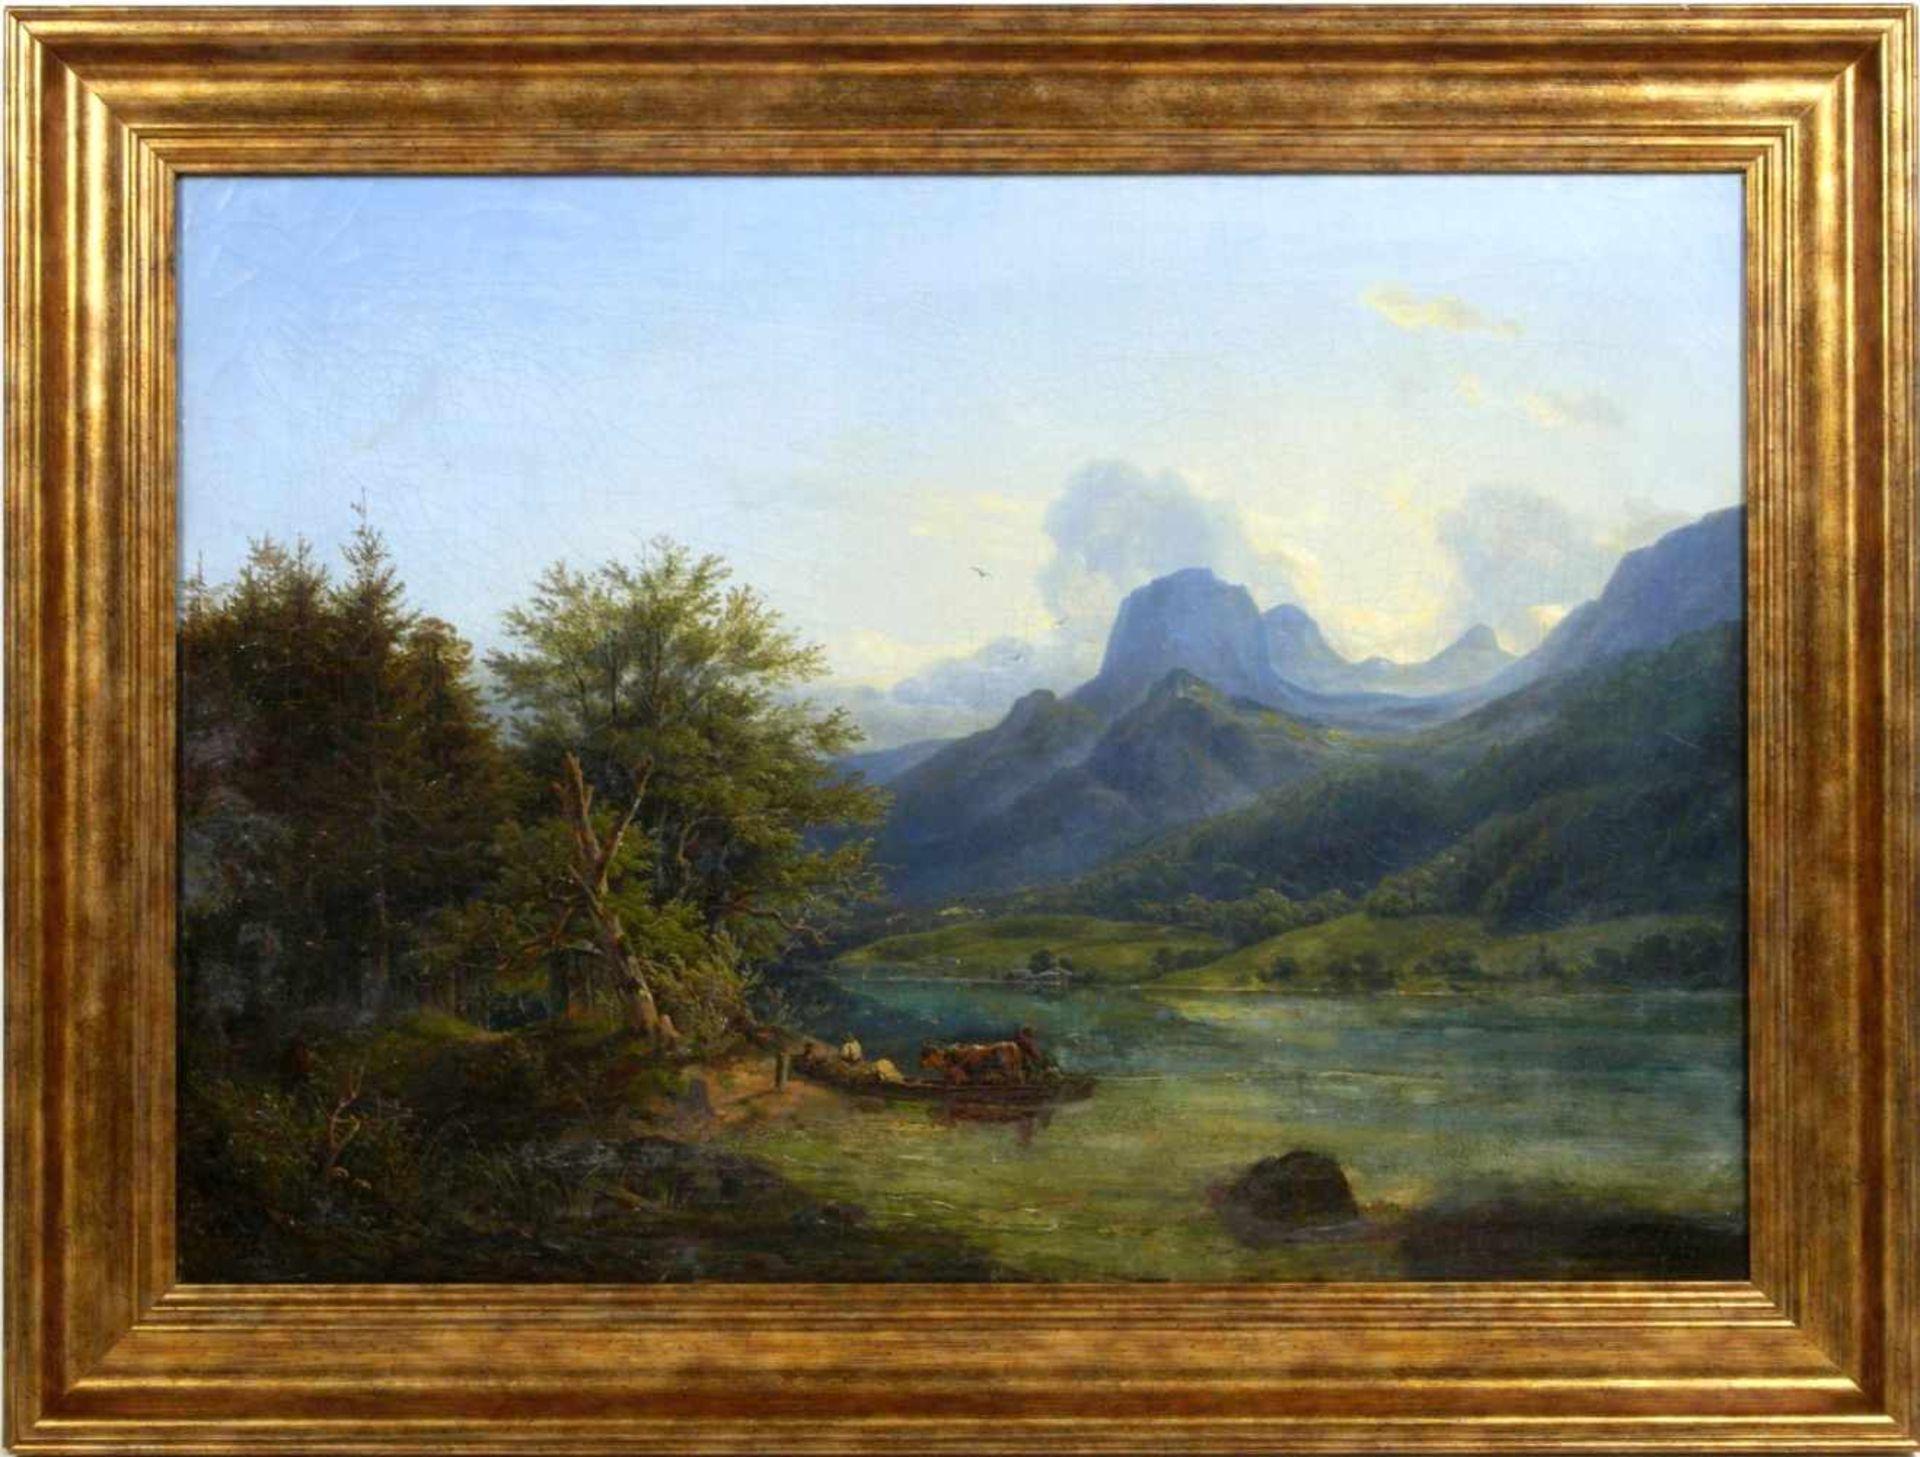 Ott, Johann Nepomuk (1804 - 1870) - Der Hintersee bei Berchtesgaden 1842Landschaftliche